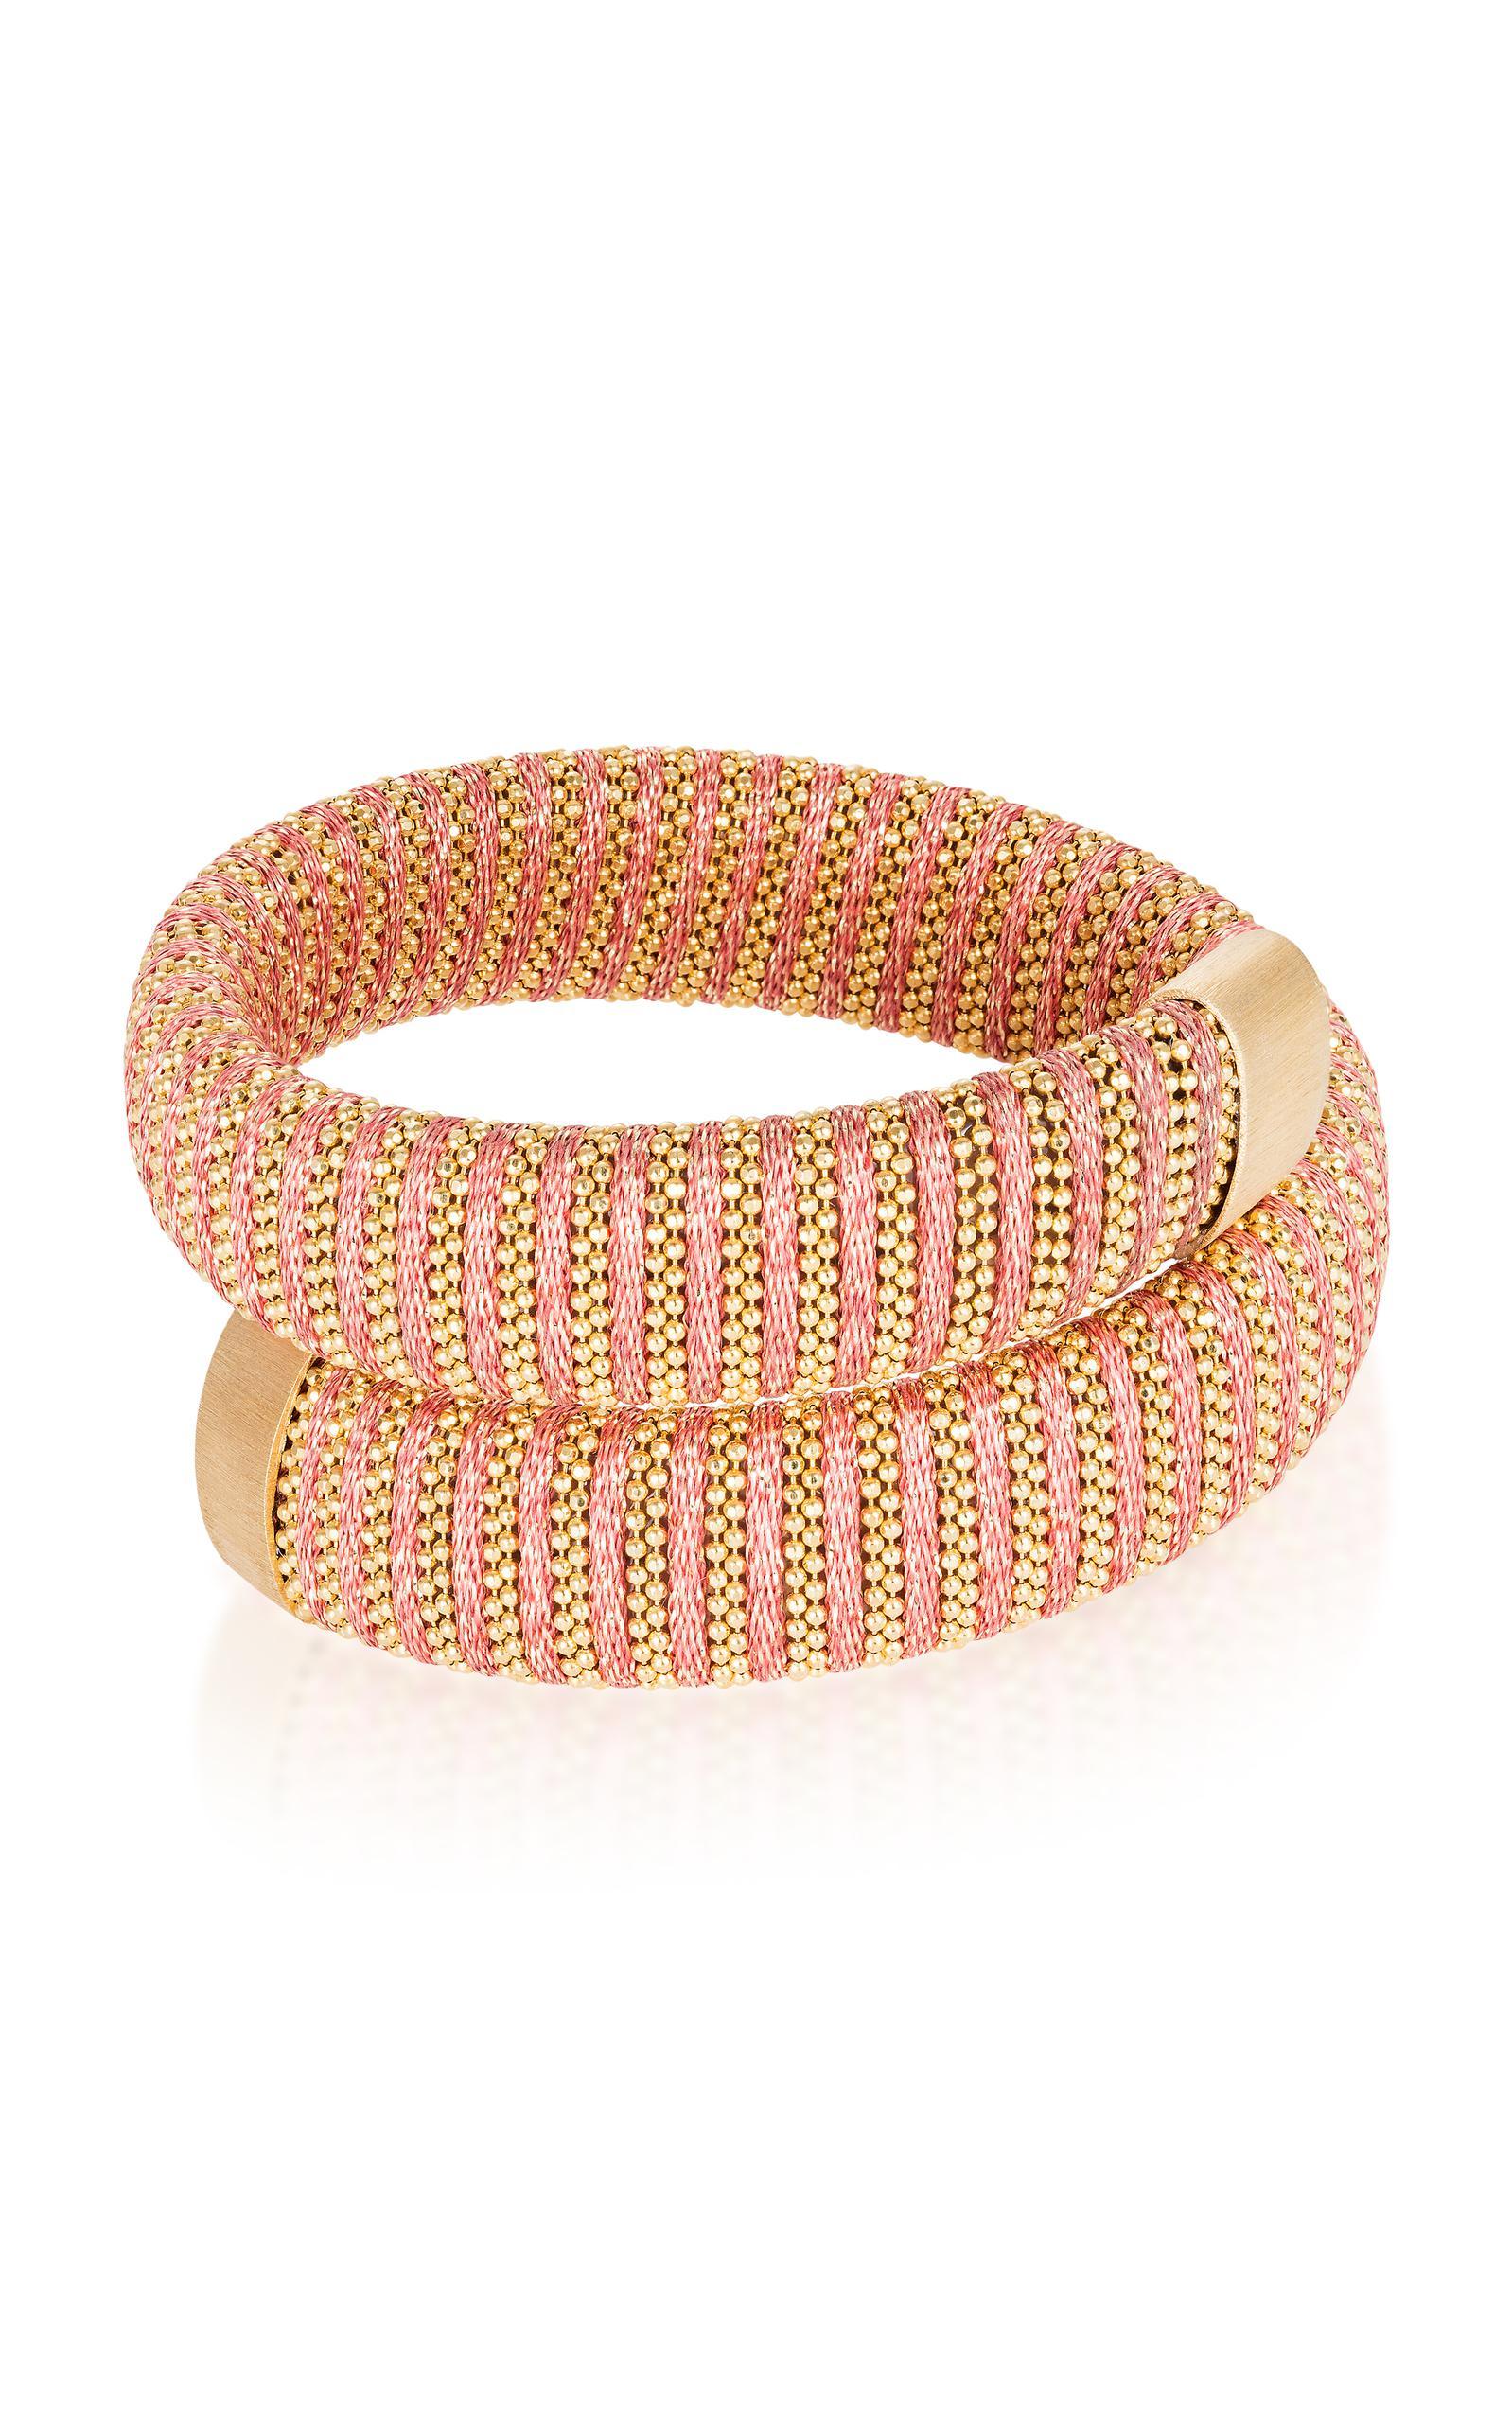 Magenta Caro Gold-Plated Bracelet Carolina Bucci oGx0E